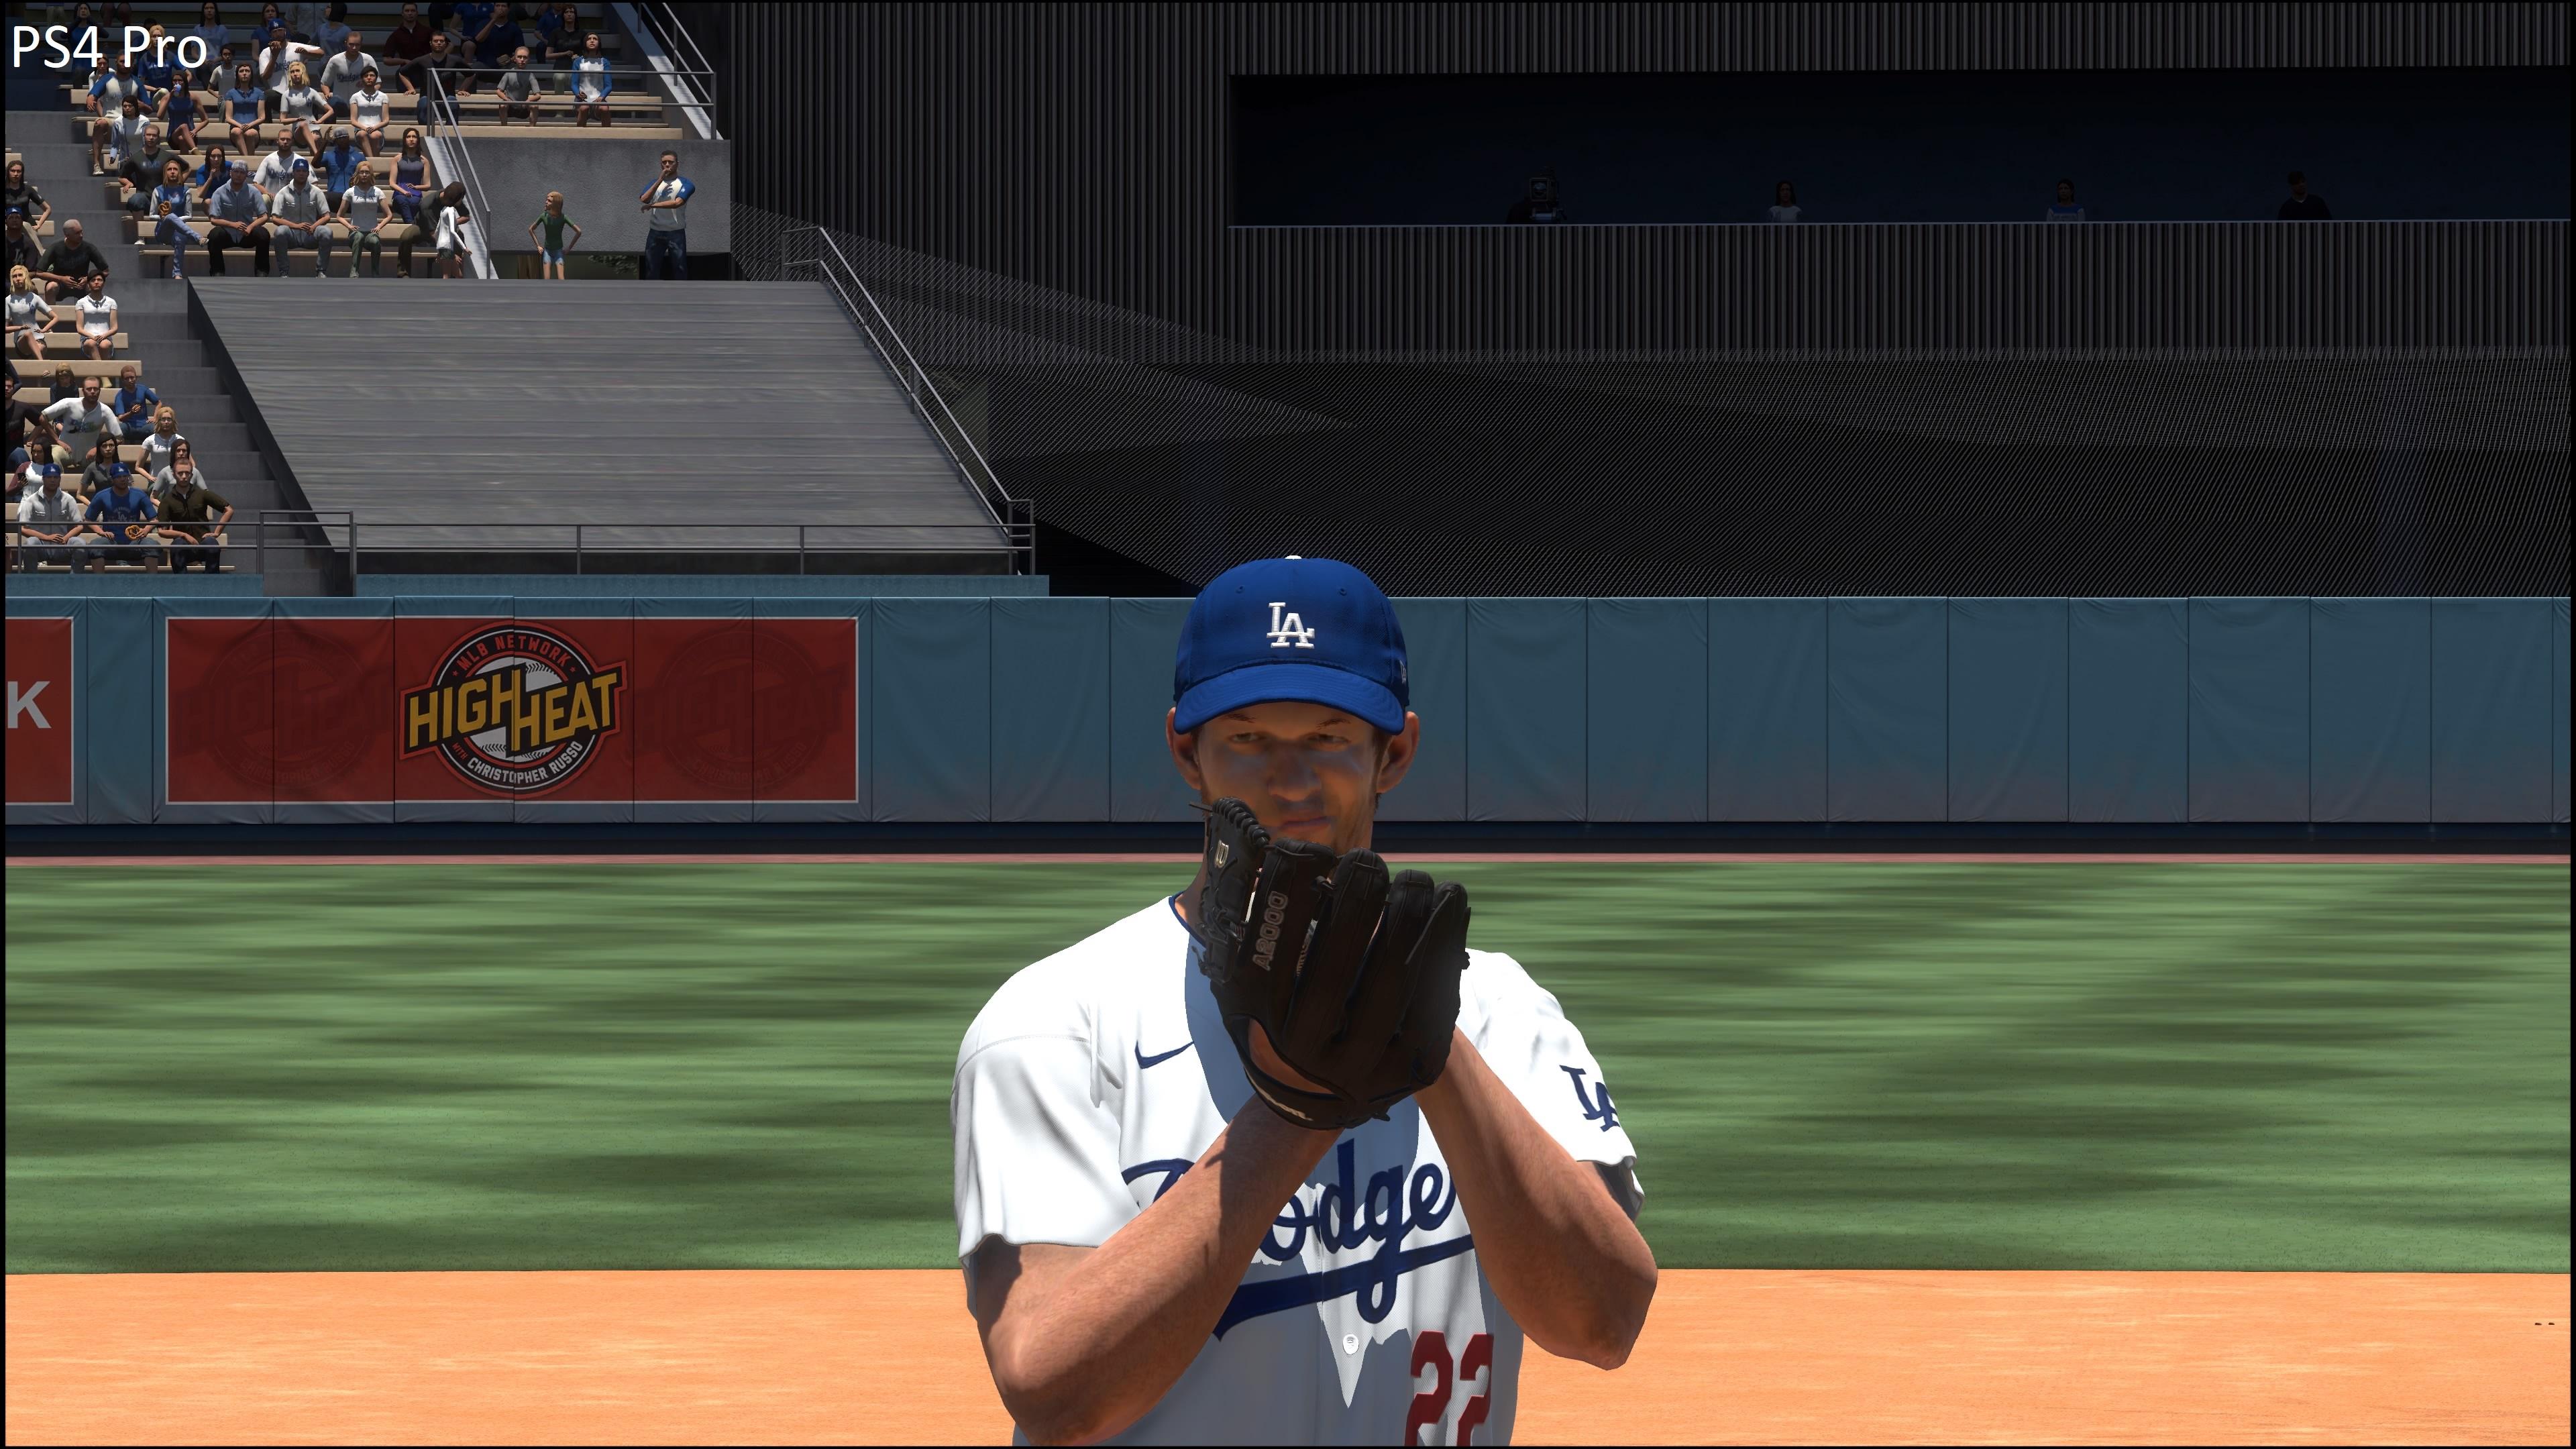 PS4 Pro Kershaw MLB The Show(TM) 21